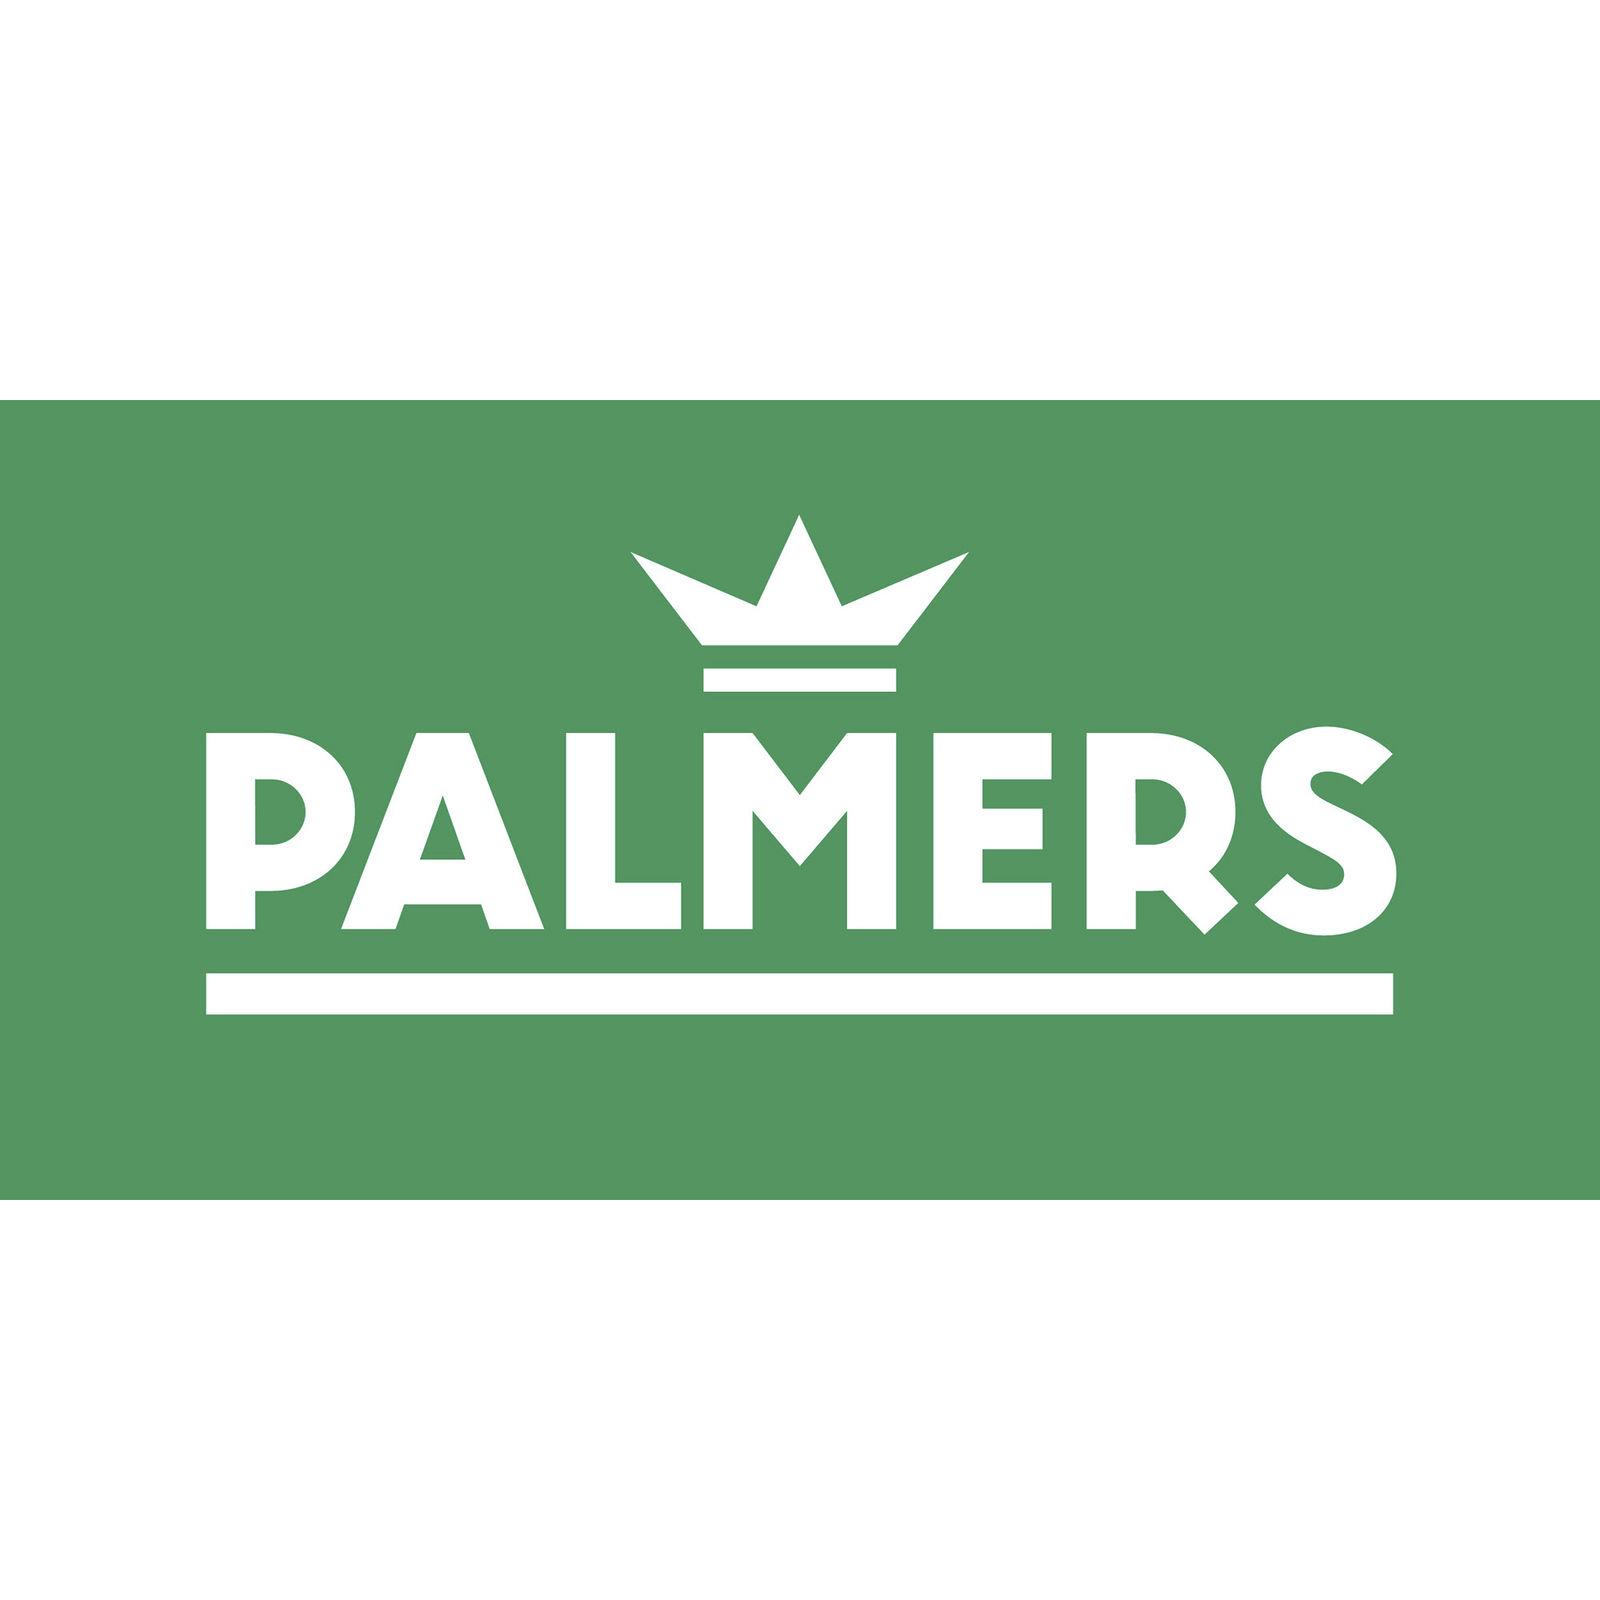 PALMERS (Bild 1)